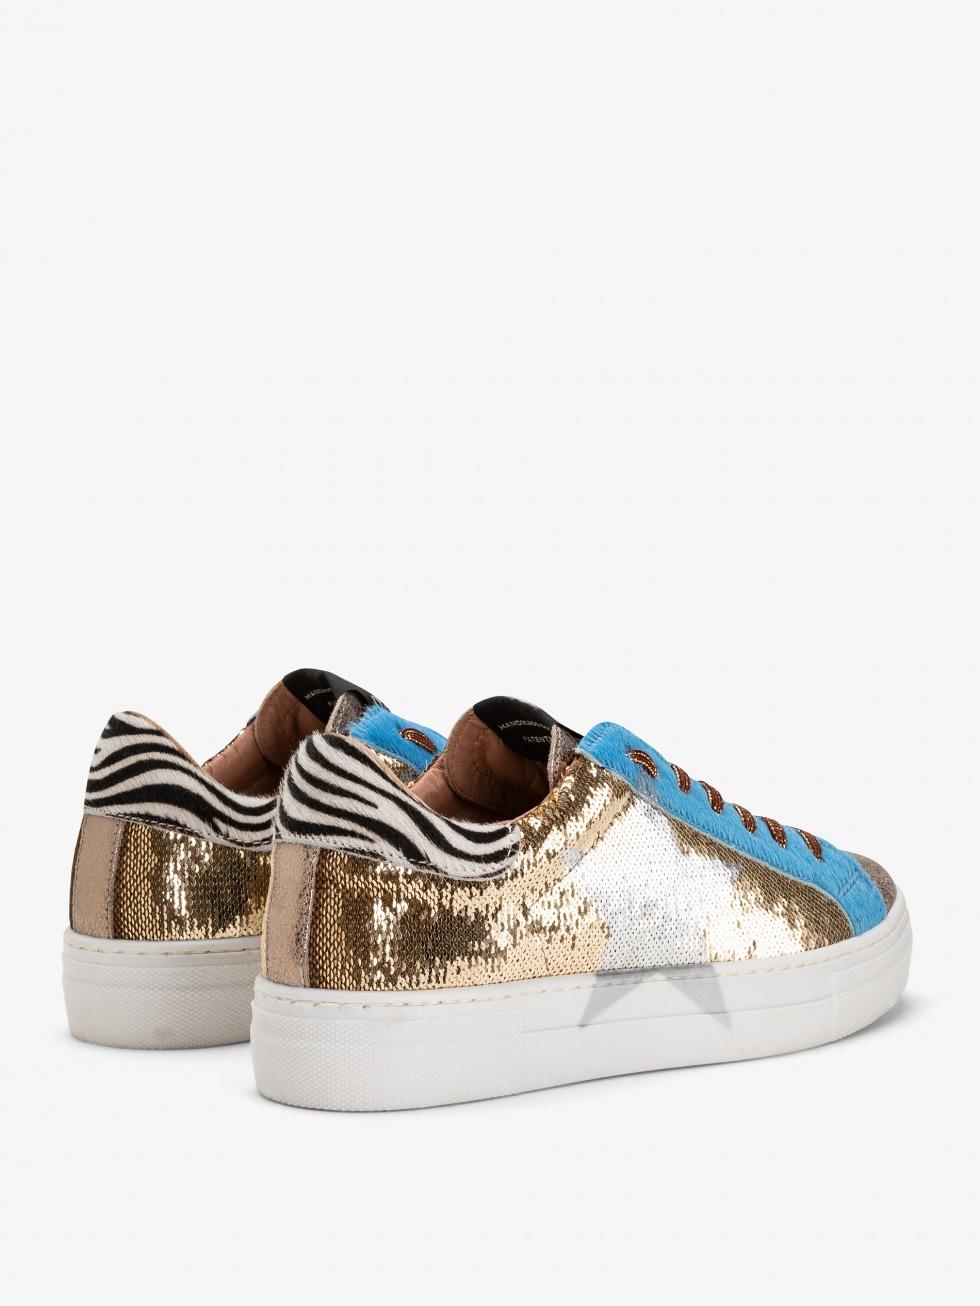 Sparkle Gold Sky Martini Sneakers - Star